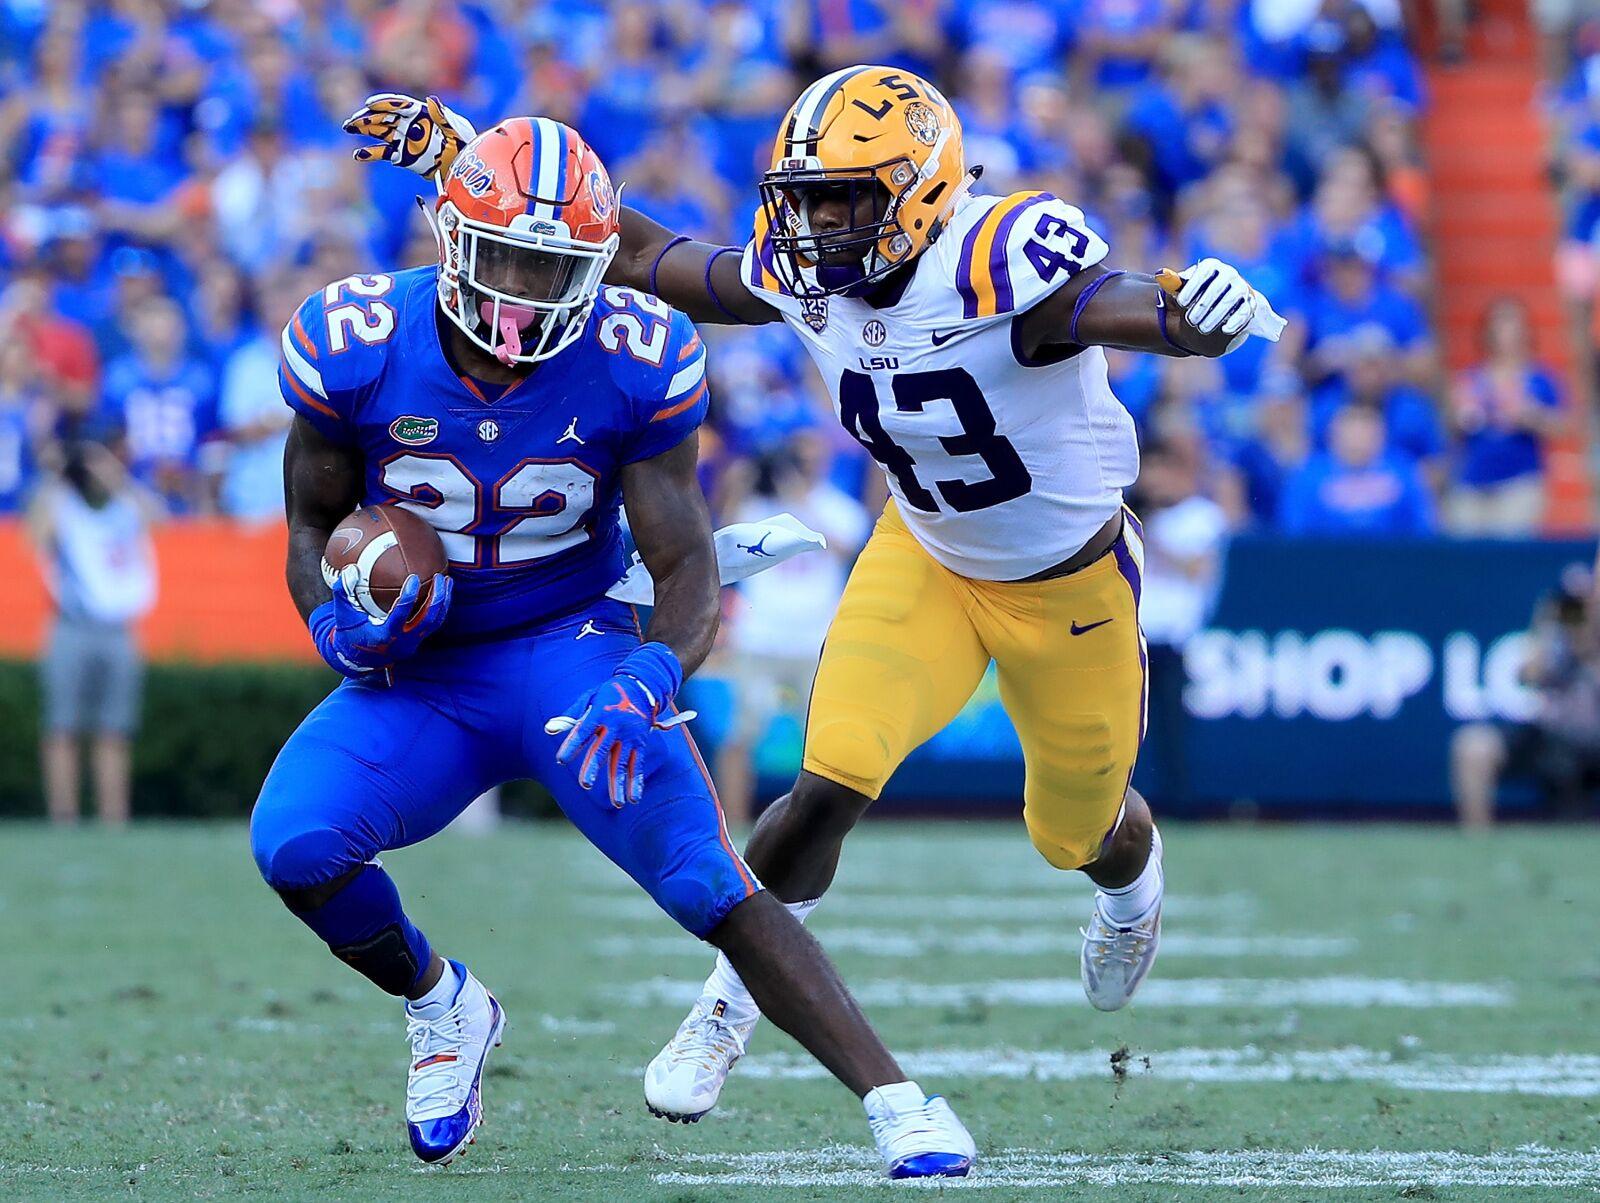 SEC Football Power Rankings 2018: LSU, Kentucky fall in Week 6